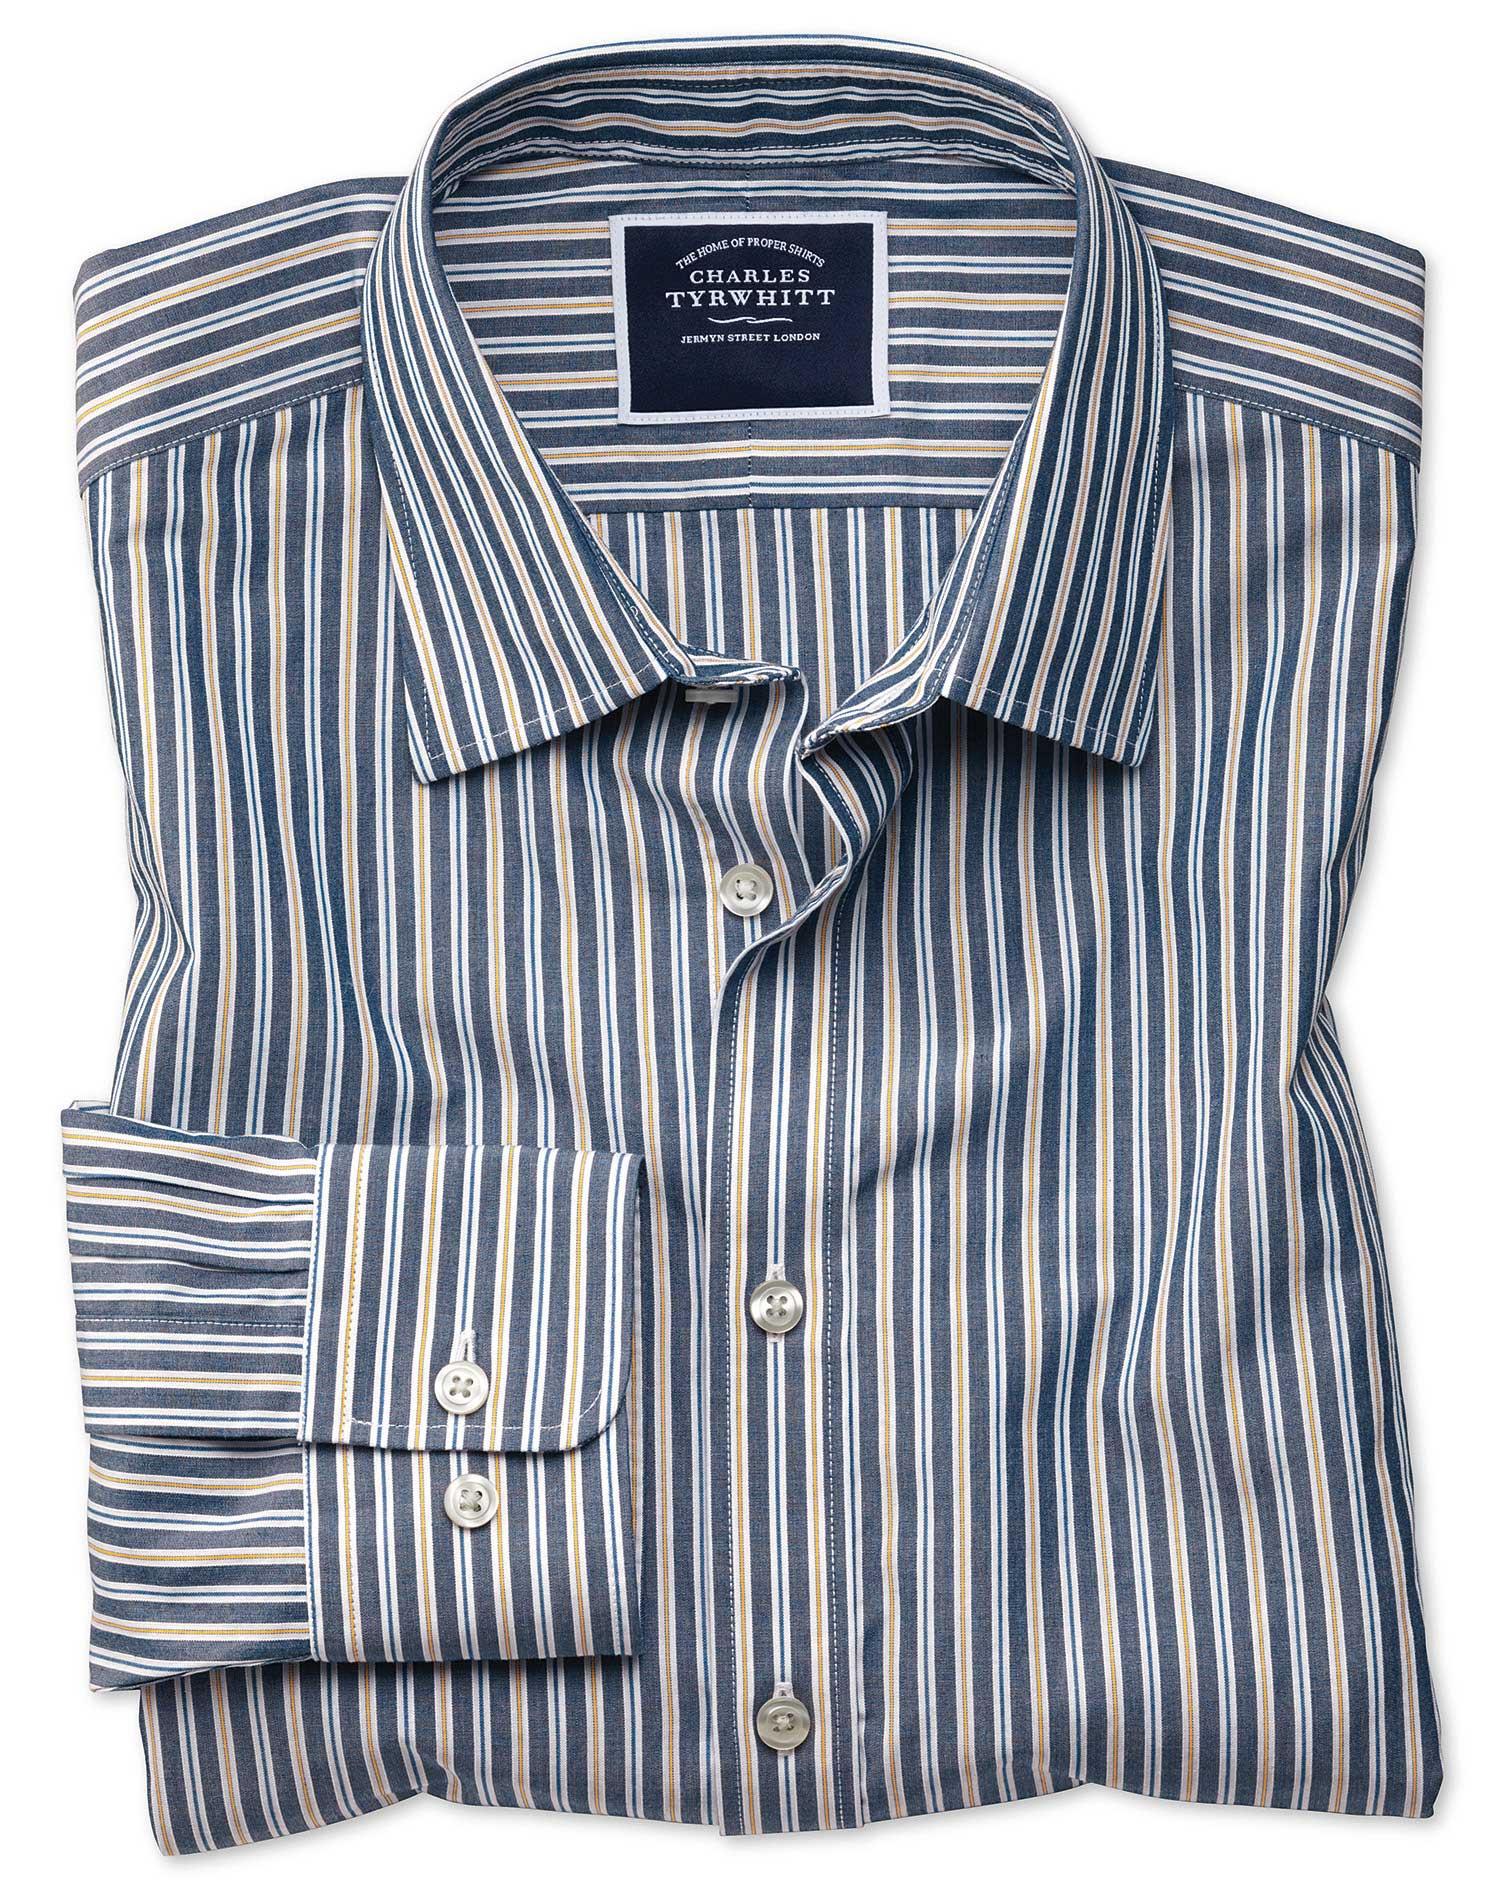 slim fit navy multi stripe soft washed cotton casual shirt single cuff size xxl by charles tyrwhitt